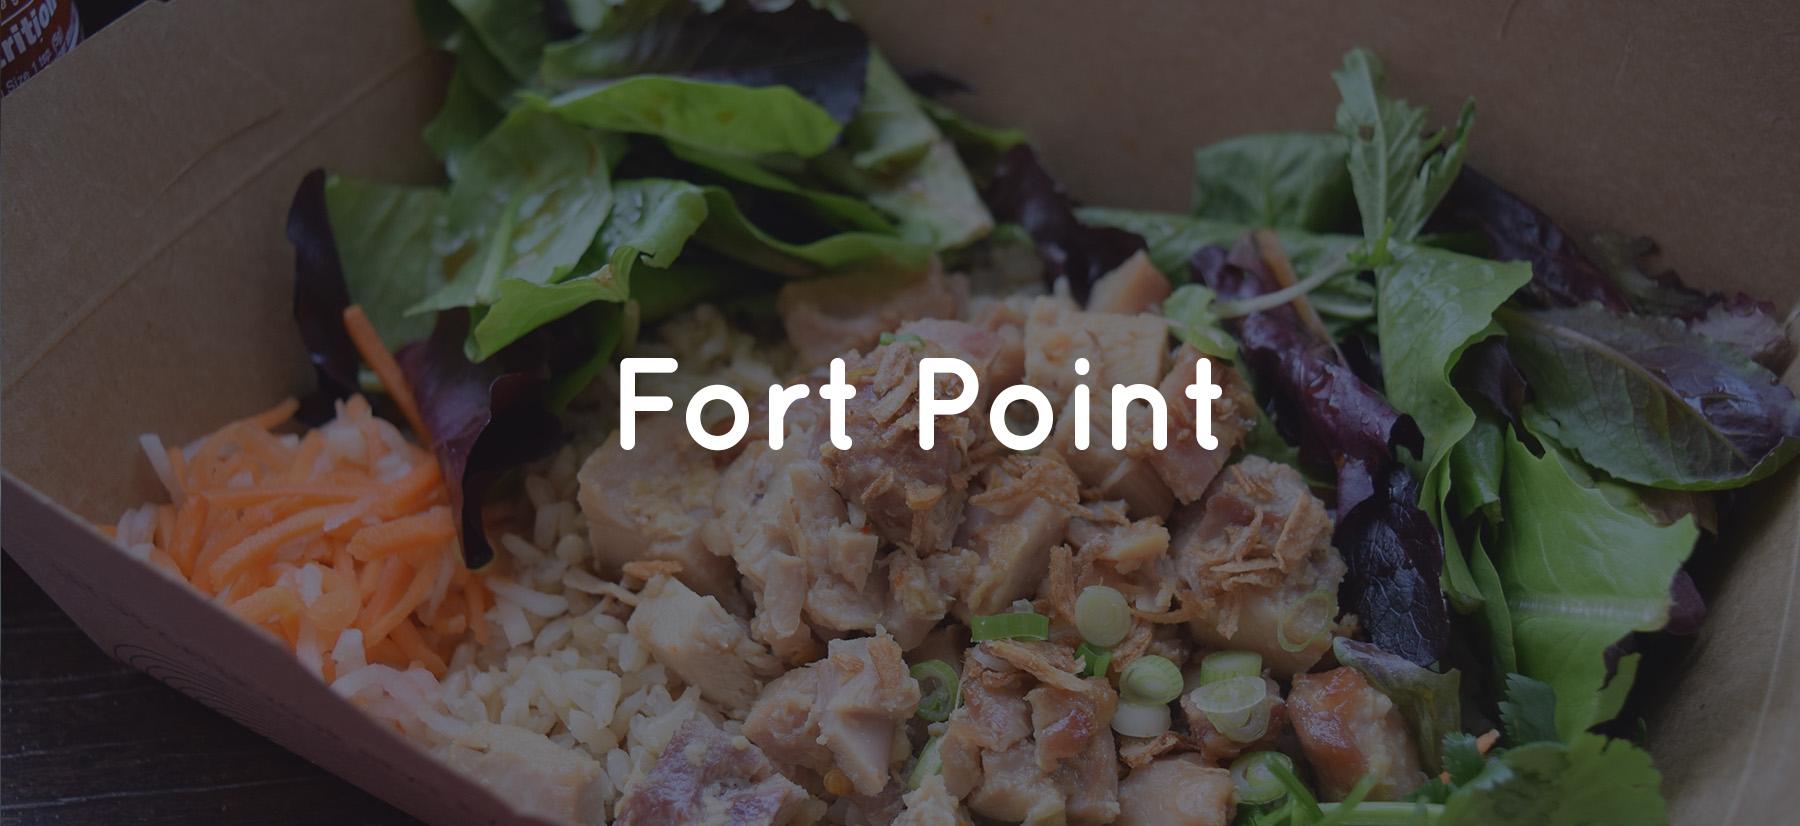 FORT POINT 4.jpg